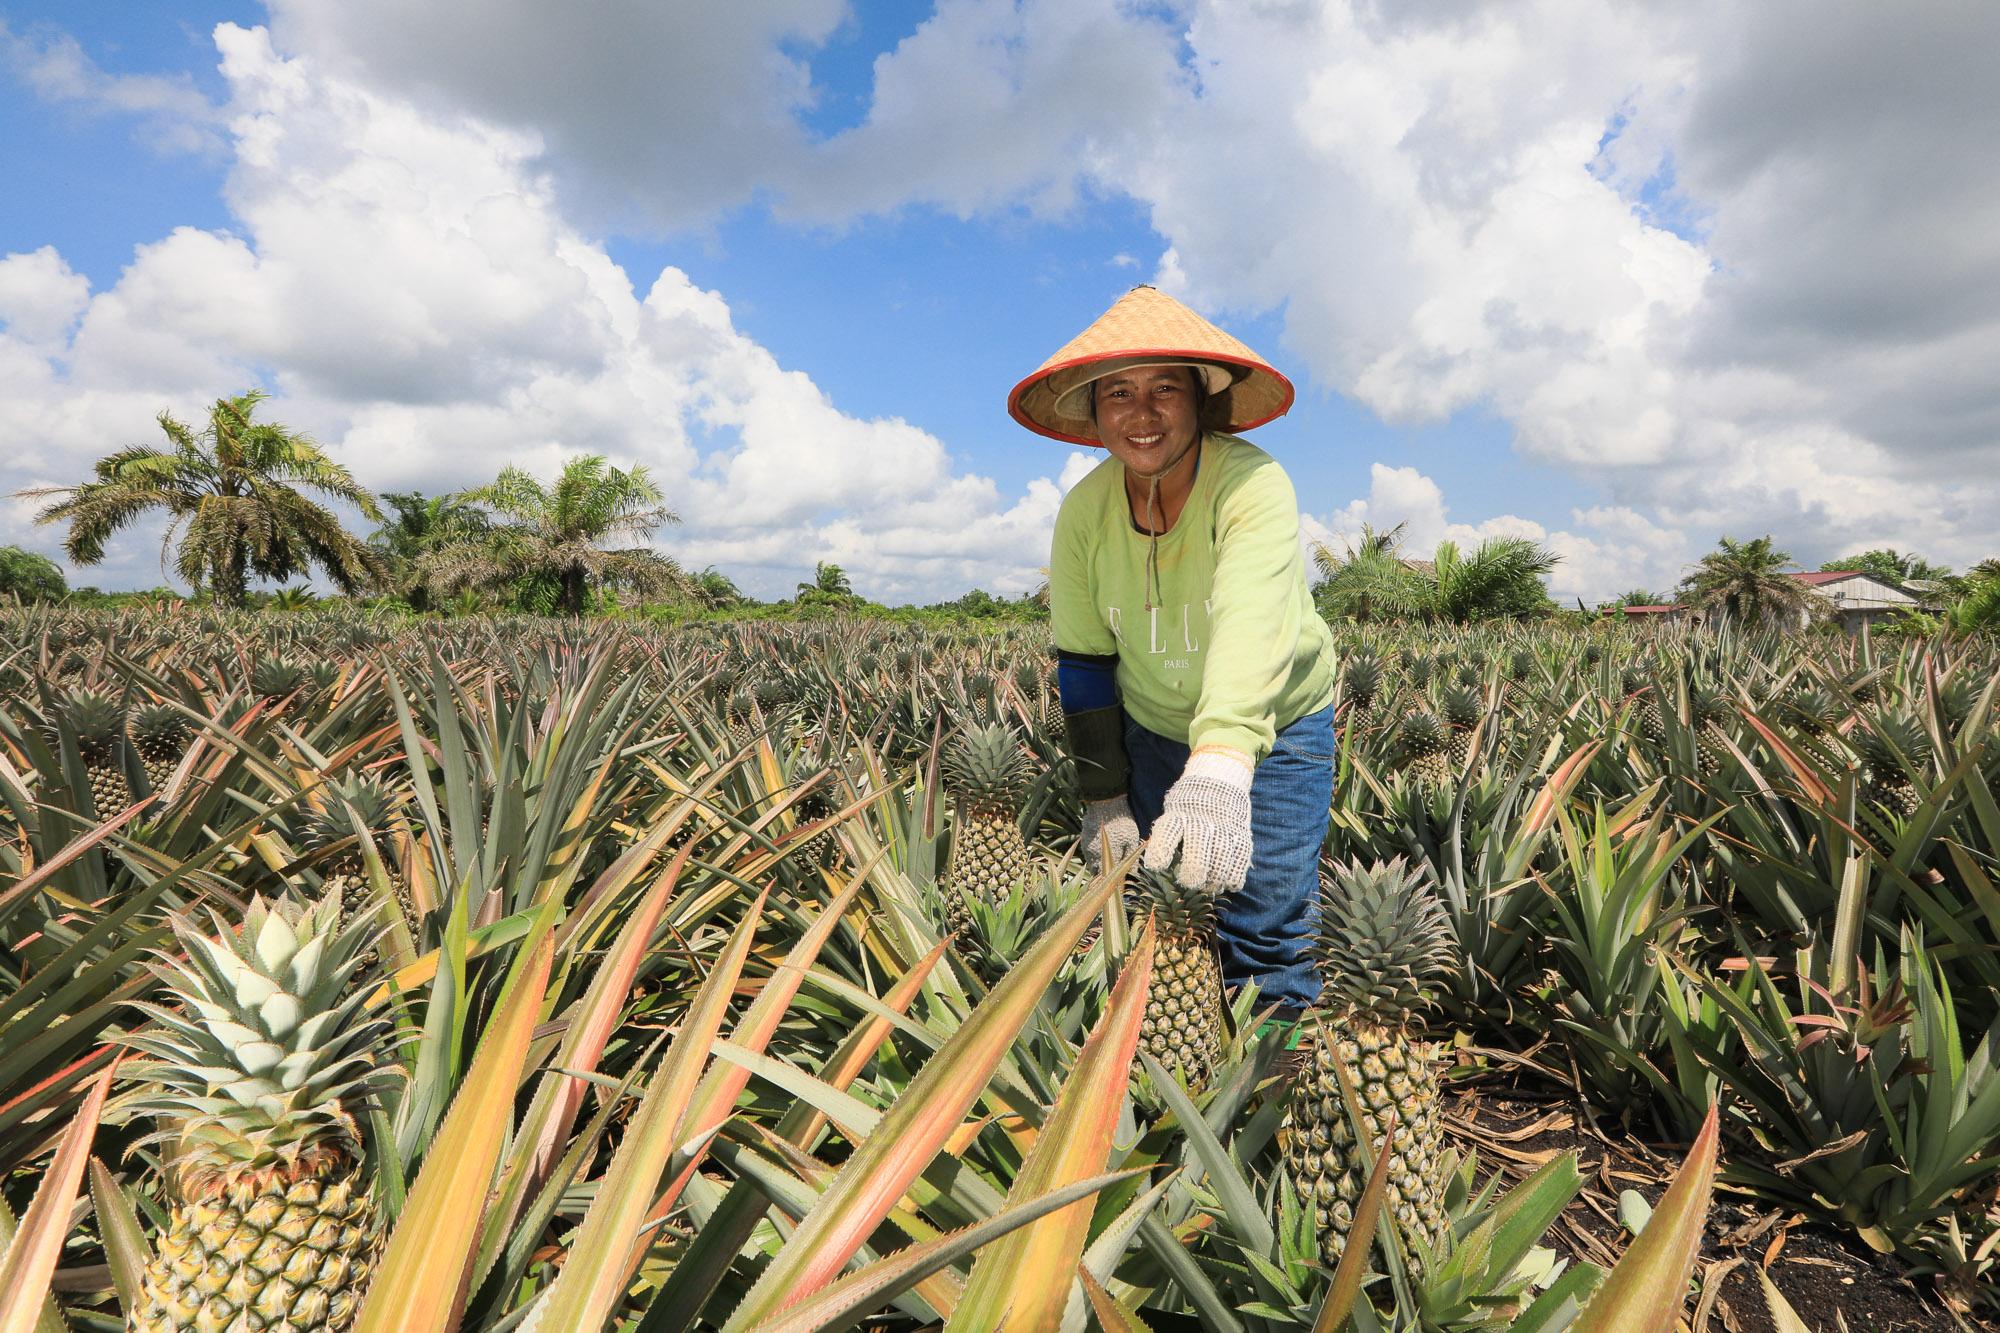 Aco one of the pineapple farmer